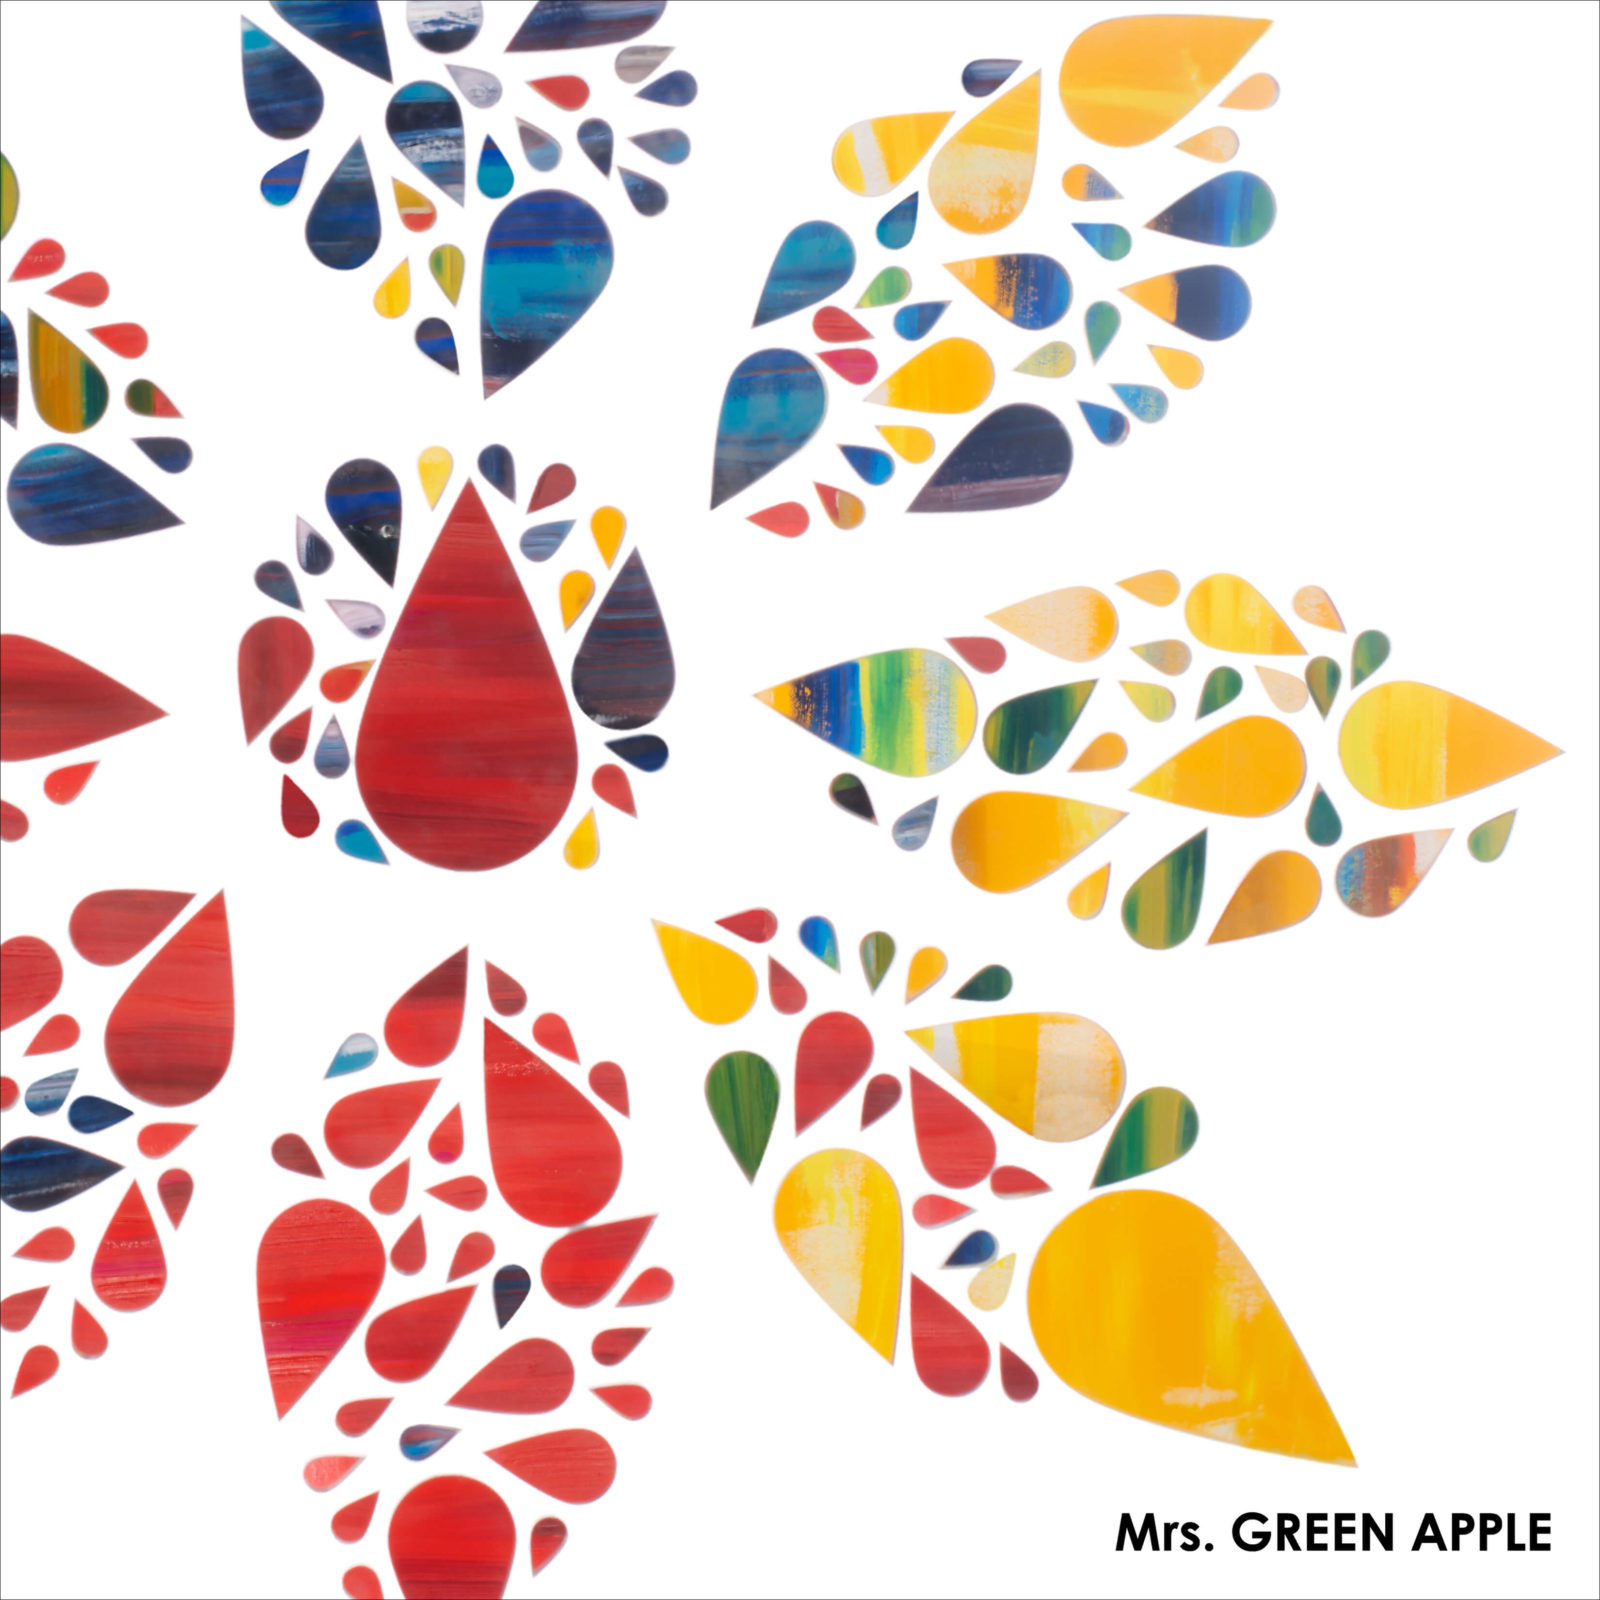 Mrs. GREEN APPLE、ニューシングルのジャケット写真&映像作品のダイジェスト映像公開サムネイル画像